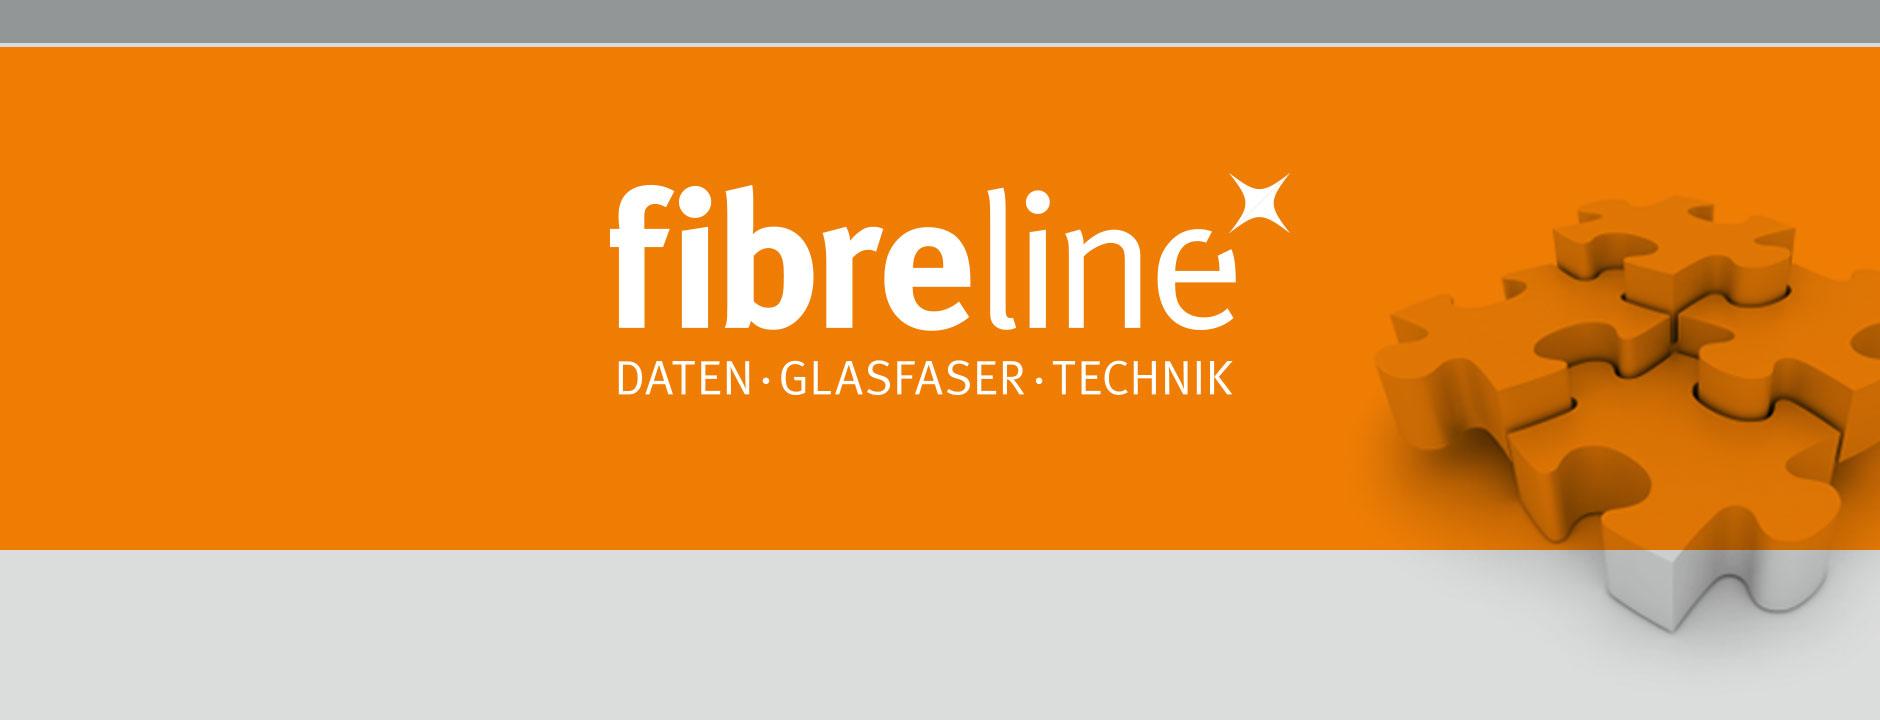 Fibreline - Design